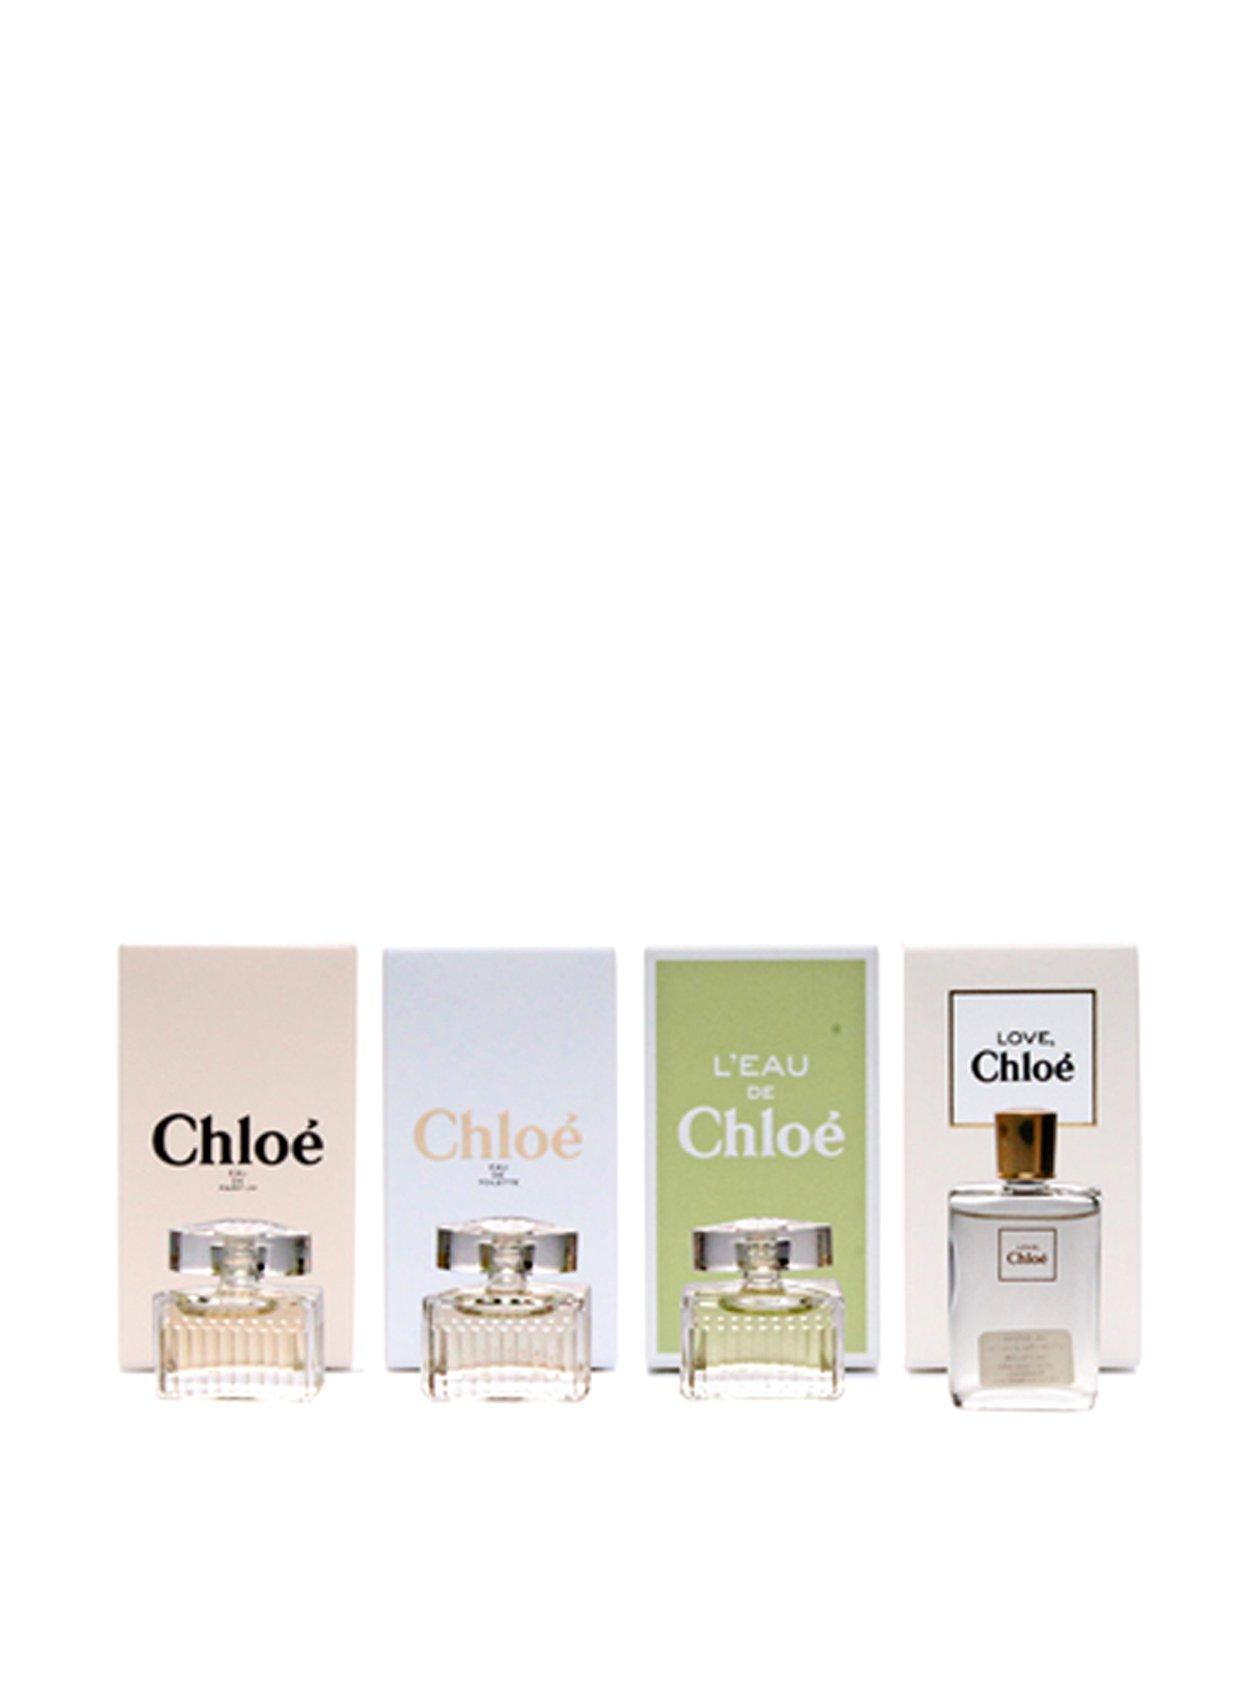 Parfums Chloe Variety Women 4 Piece Gift Set for Men